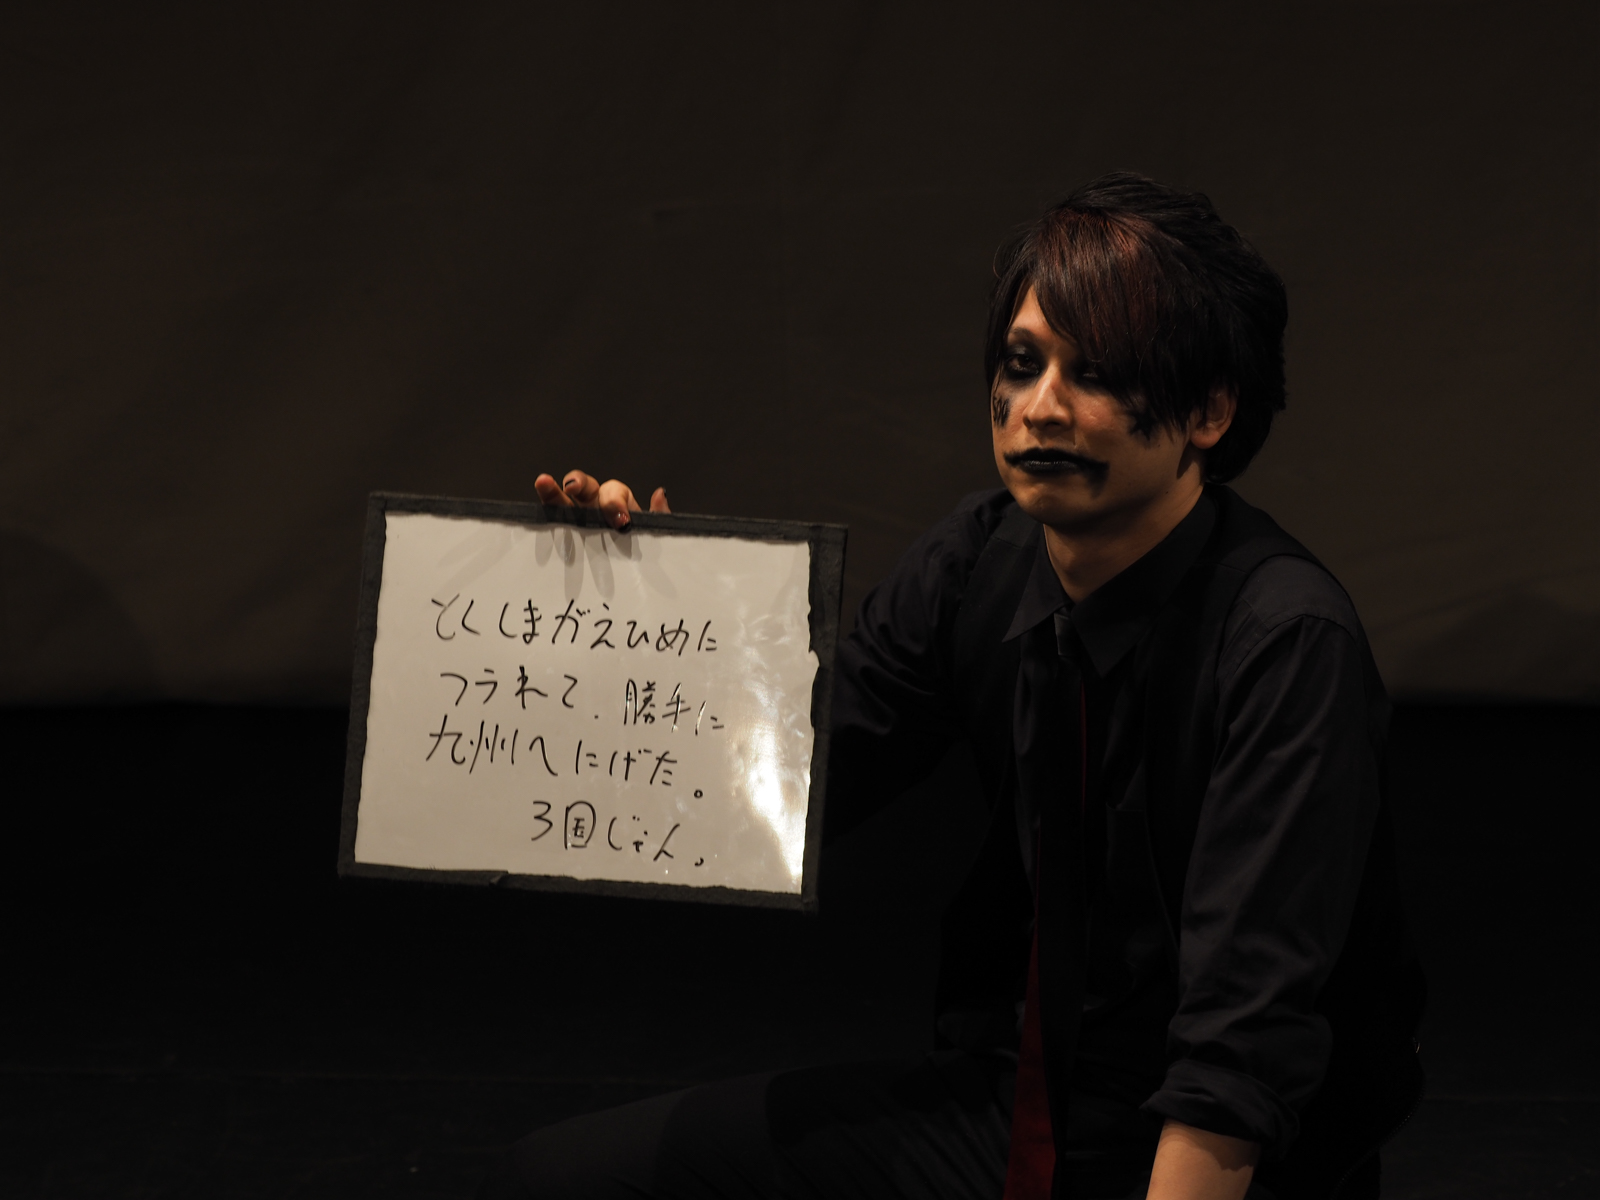 f:id:motomachi24:20161108205038j:plain